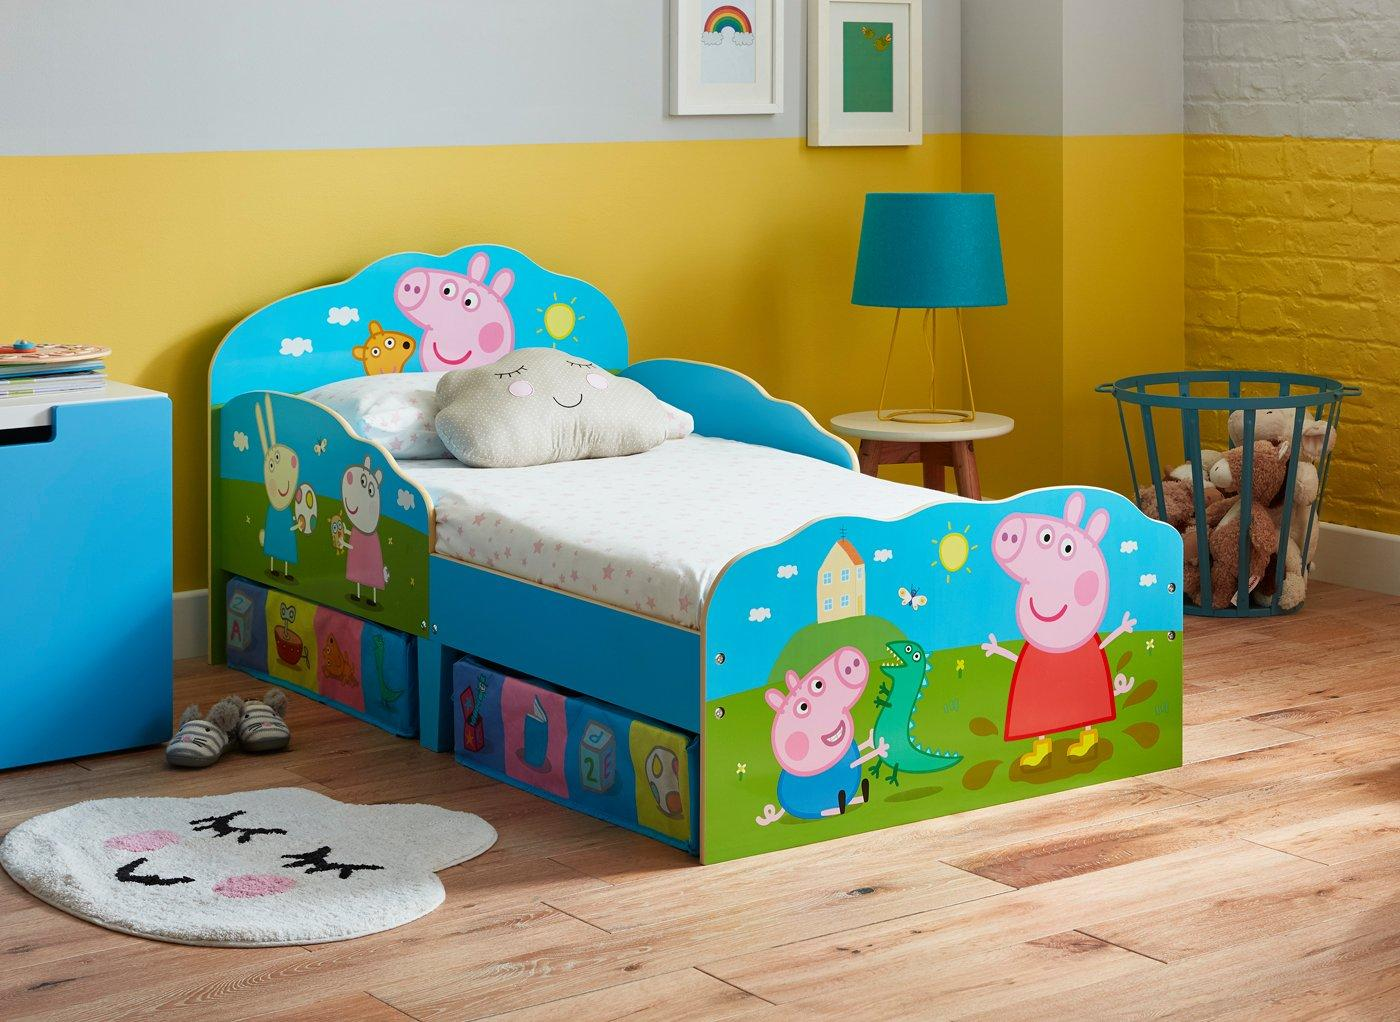 Peppa Pig Toddler Bed Frame With Storage | Kids Beds | Kids ...